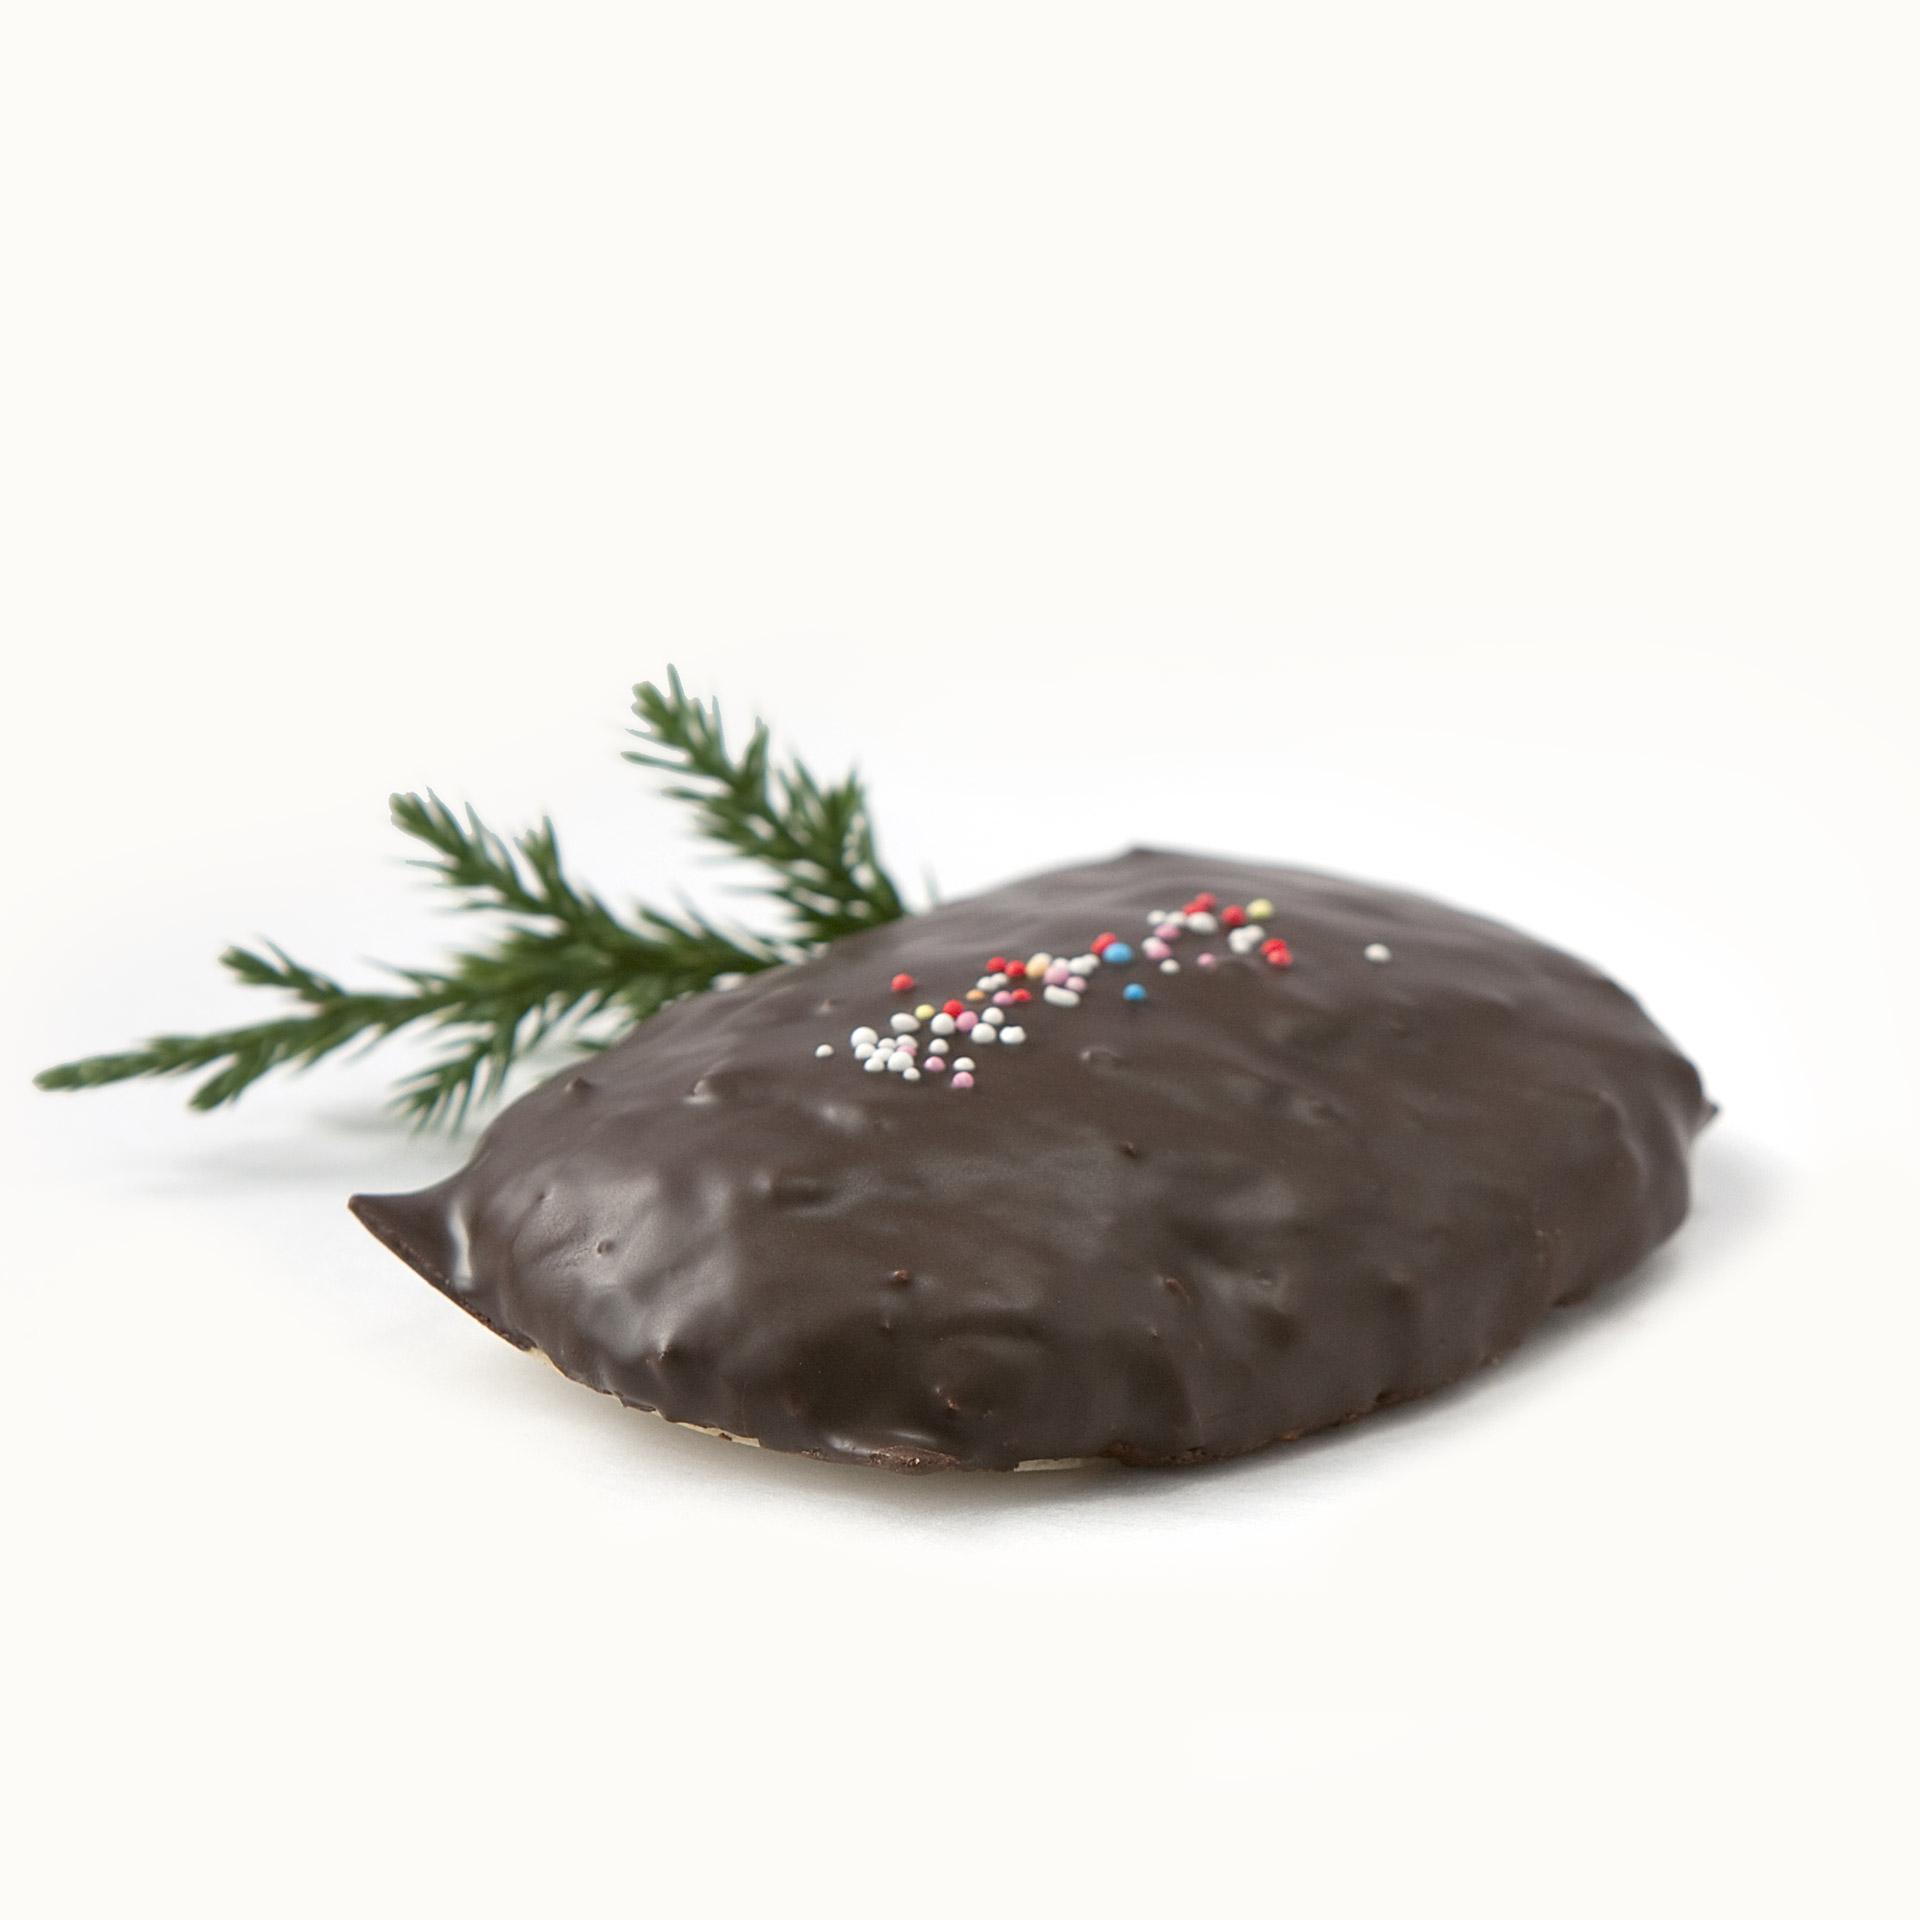 Lebkuchen Nürnberger Art mit Schokolade (5 Stk.)